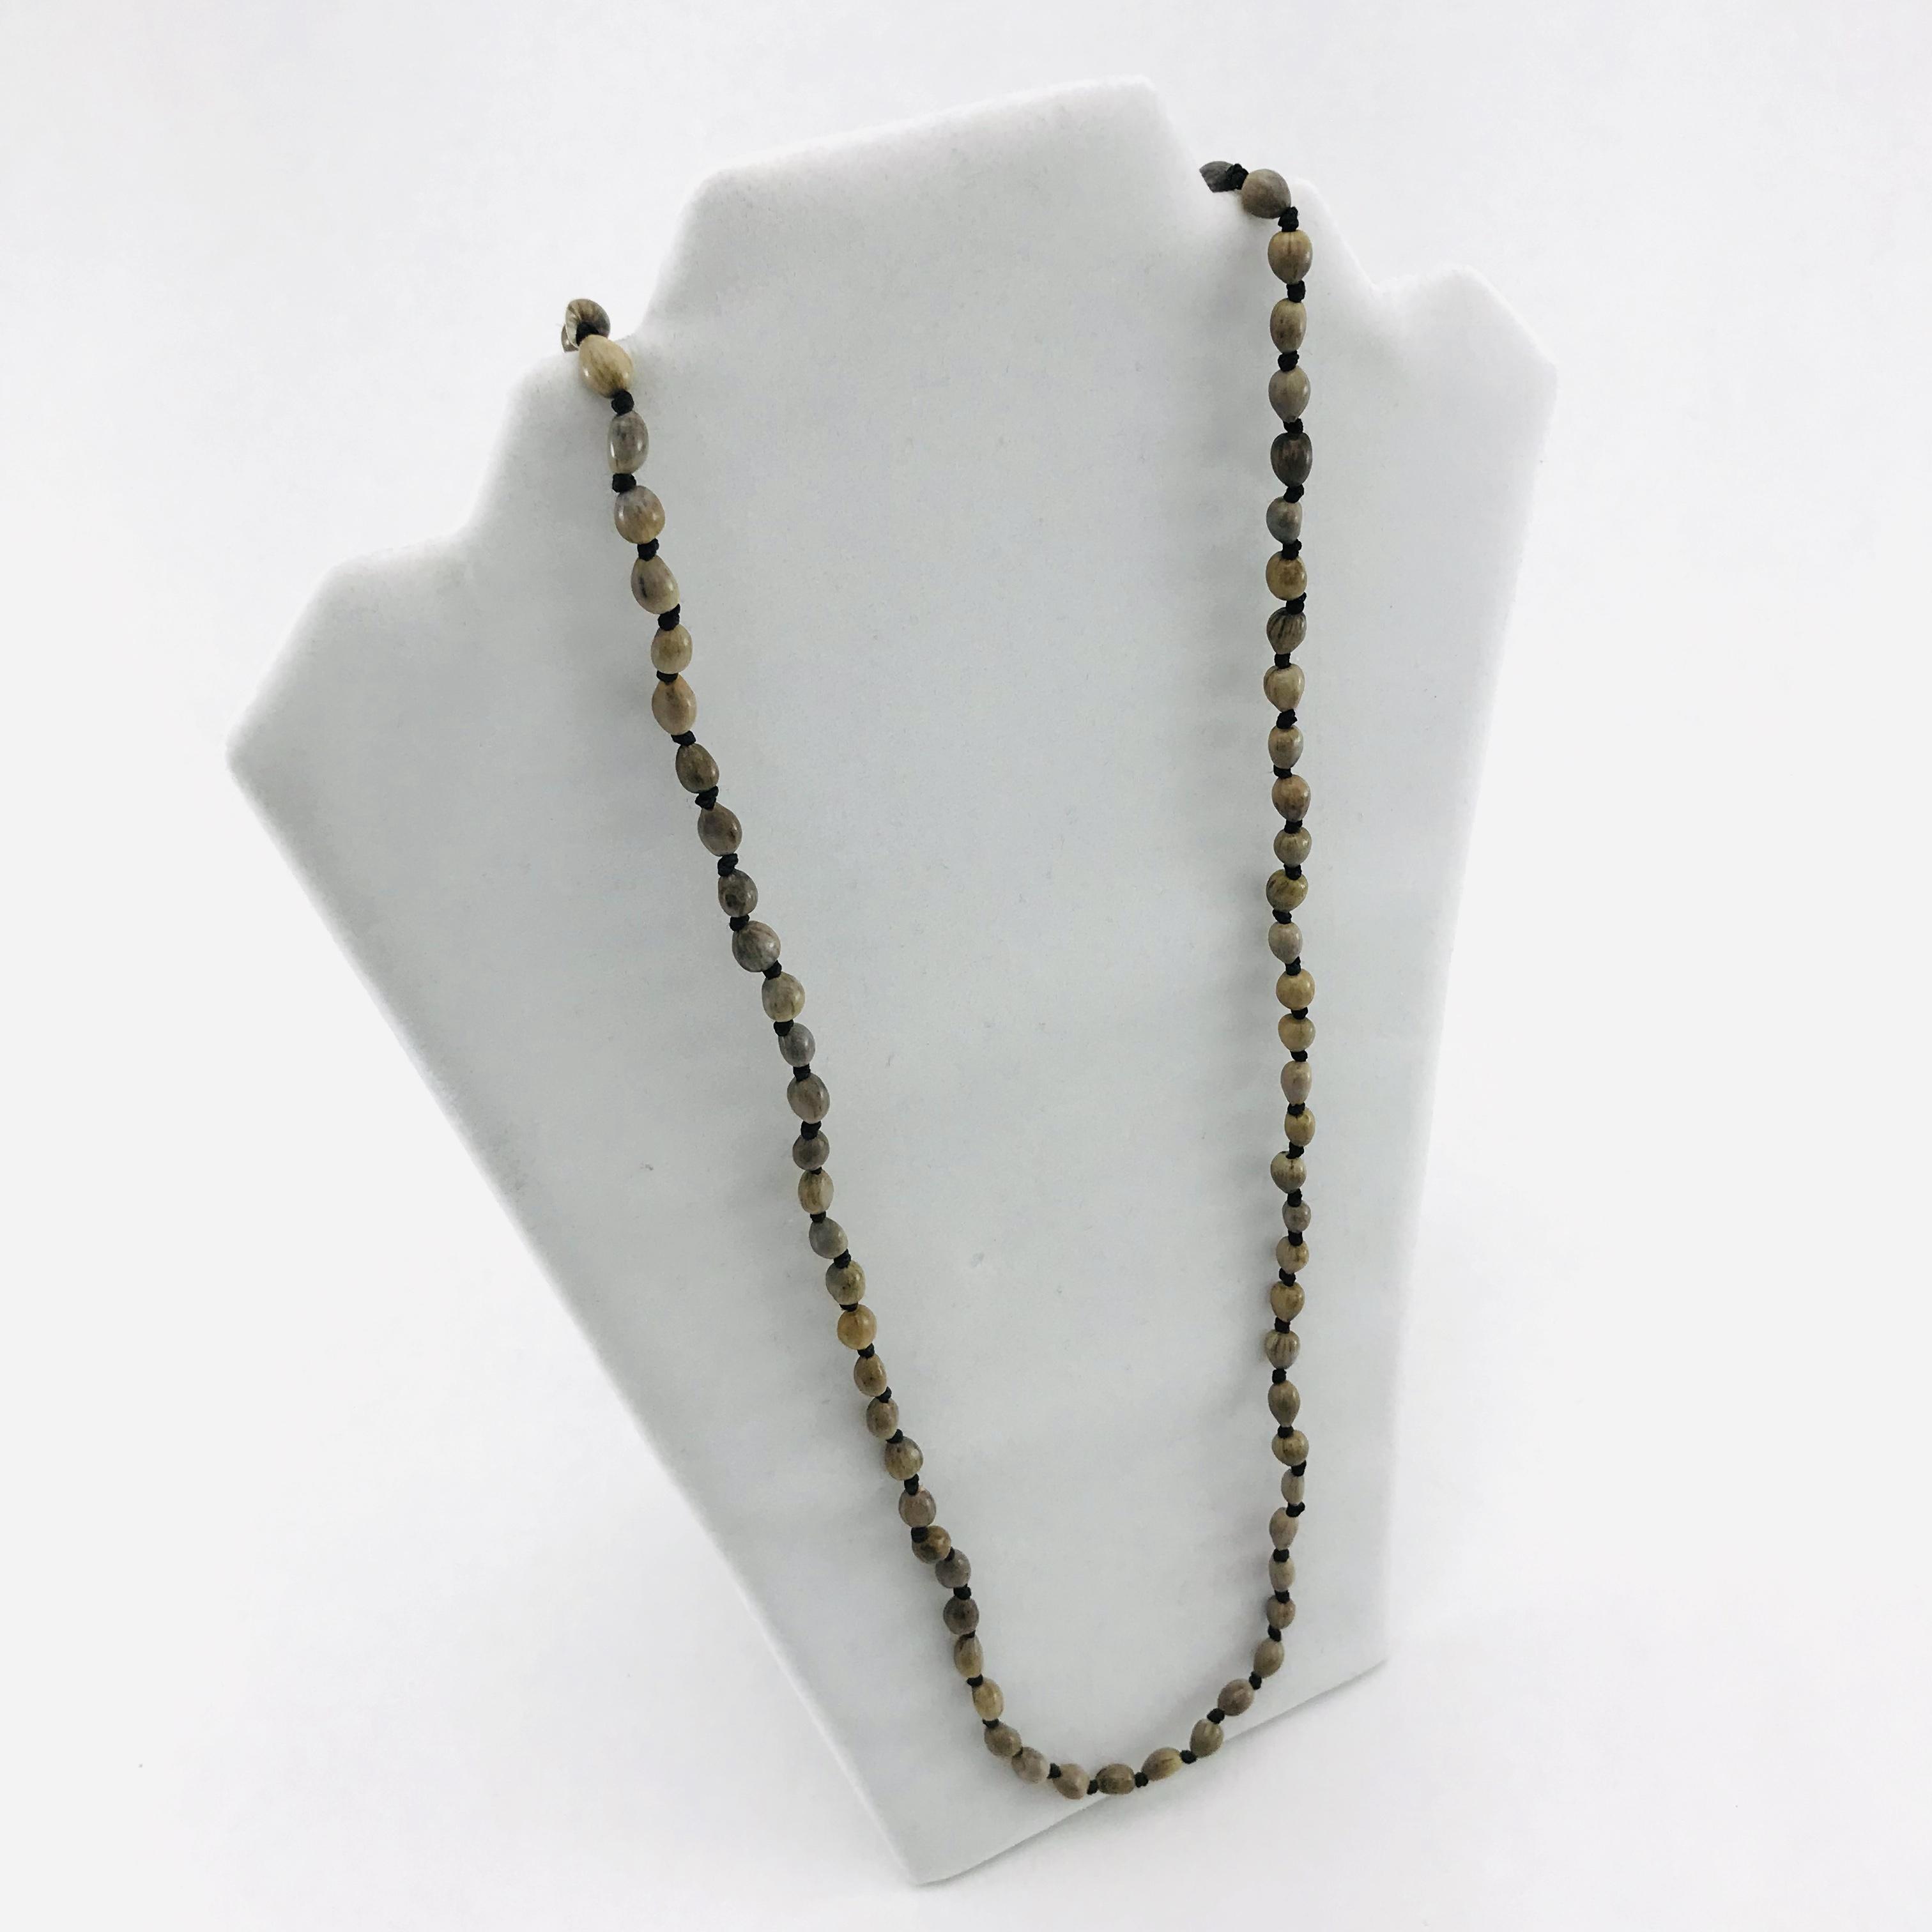 L'infini - Collier graines naturelles - 1 rang - Brun